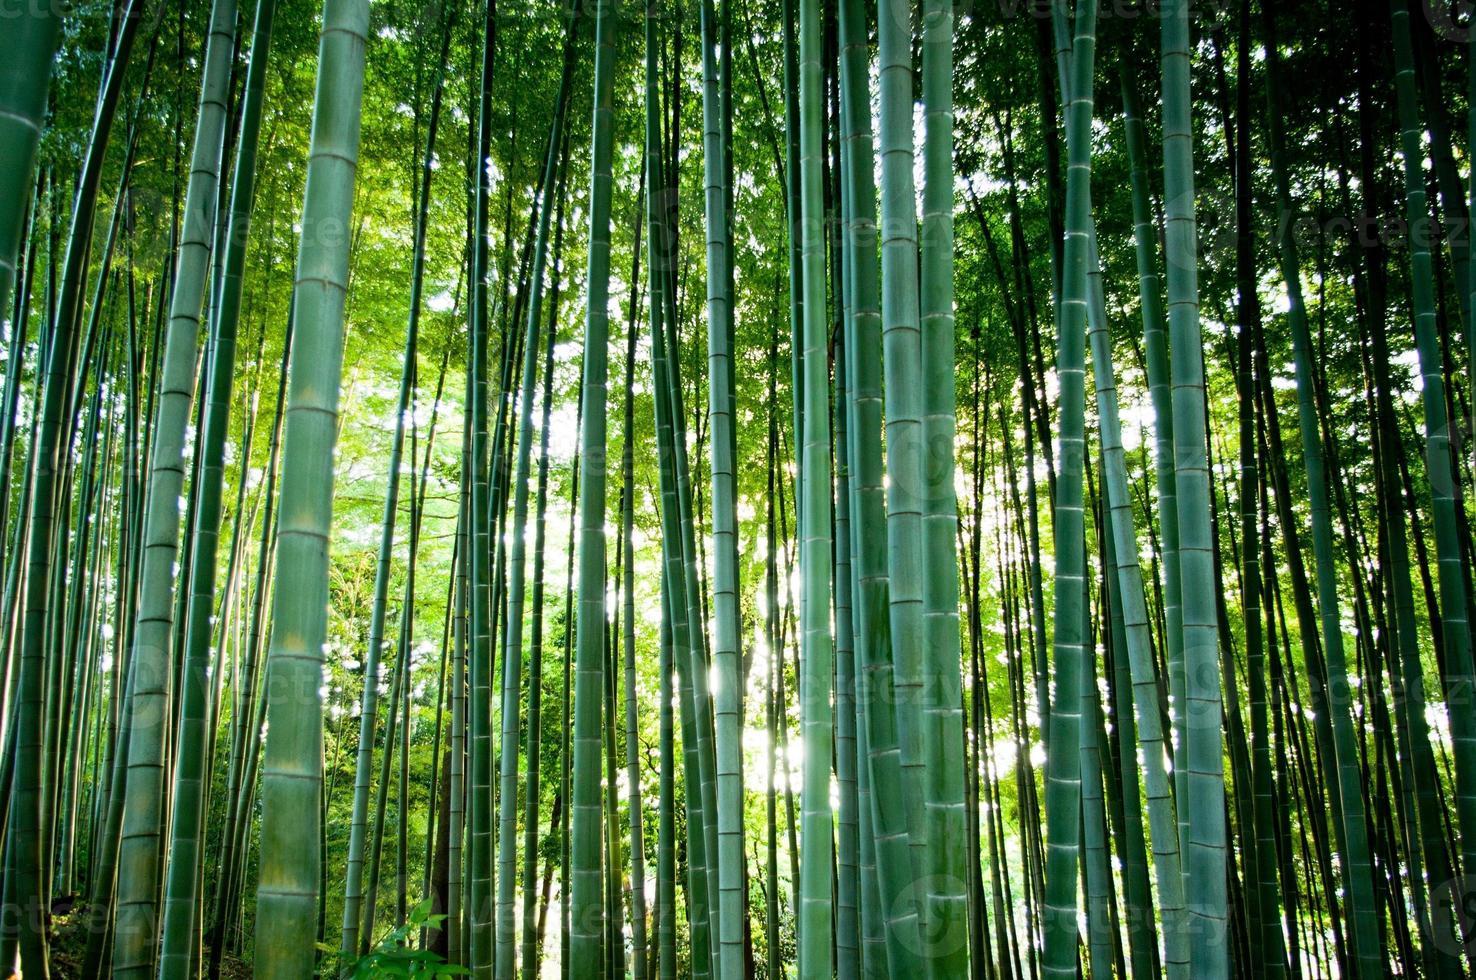 foret de bambou photo